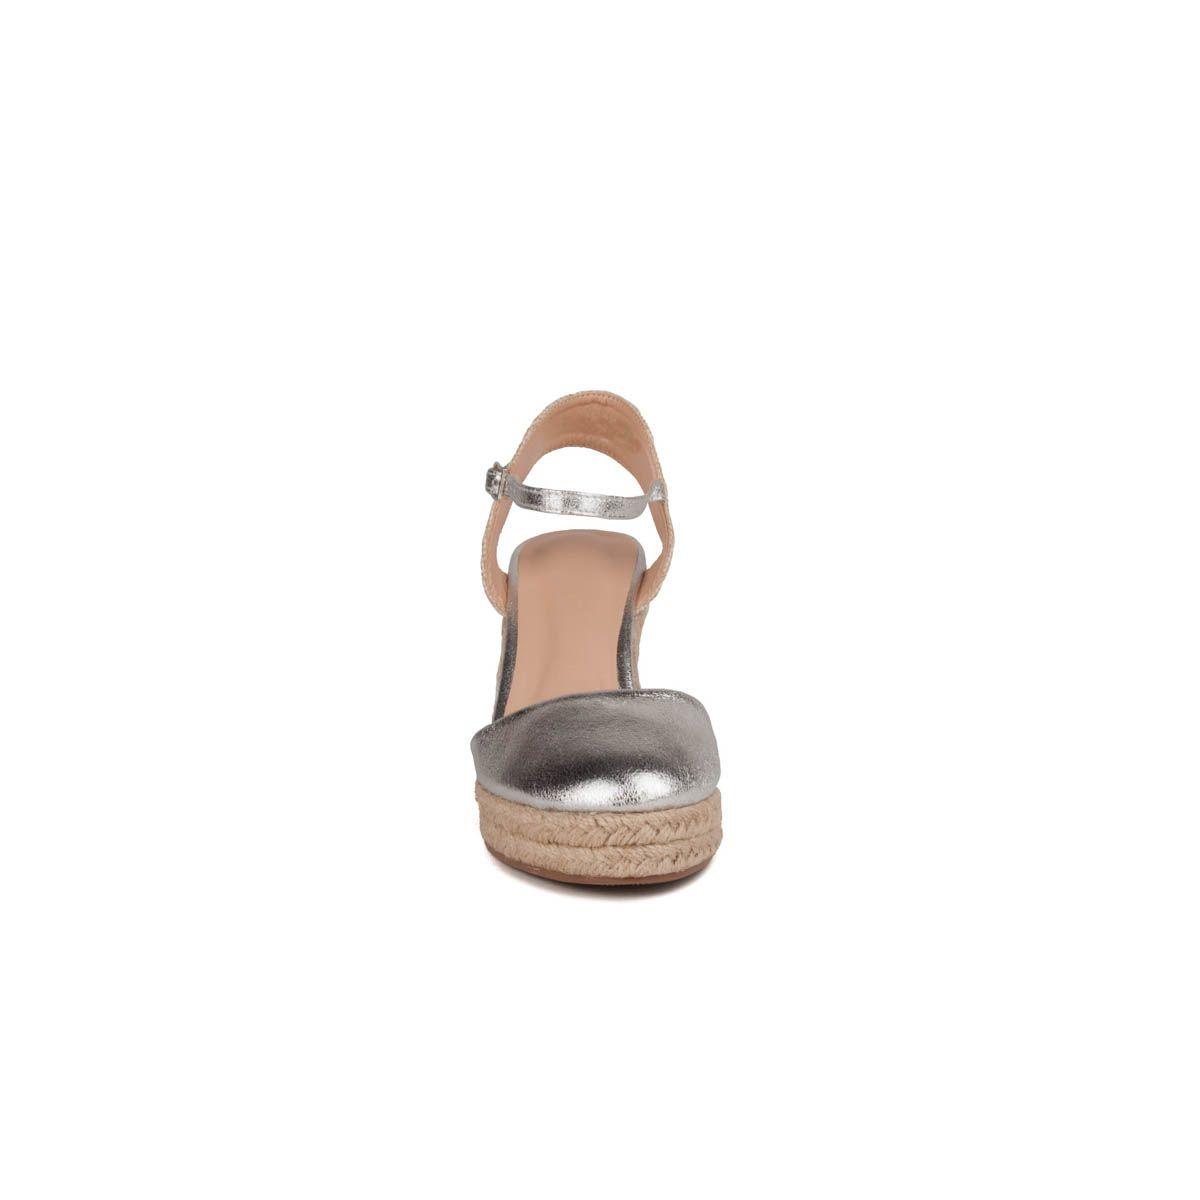 Montevita Ankle Strap Wedge Espadrille in Silver